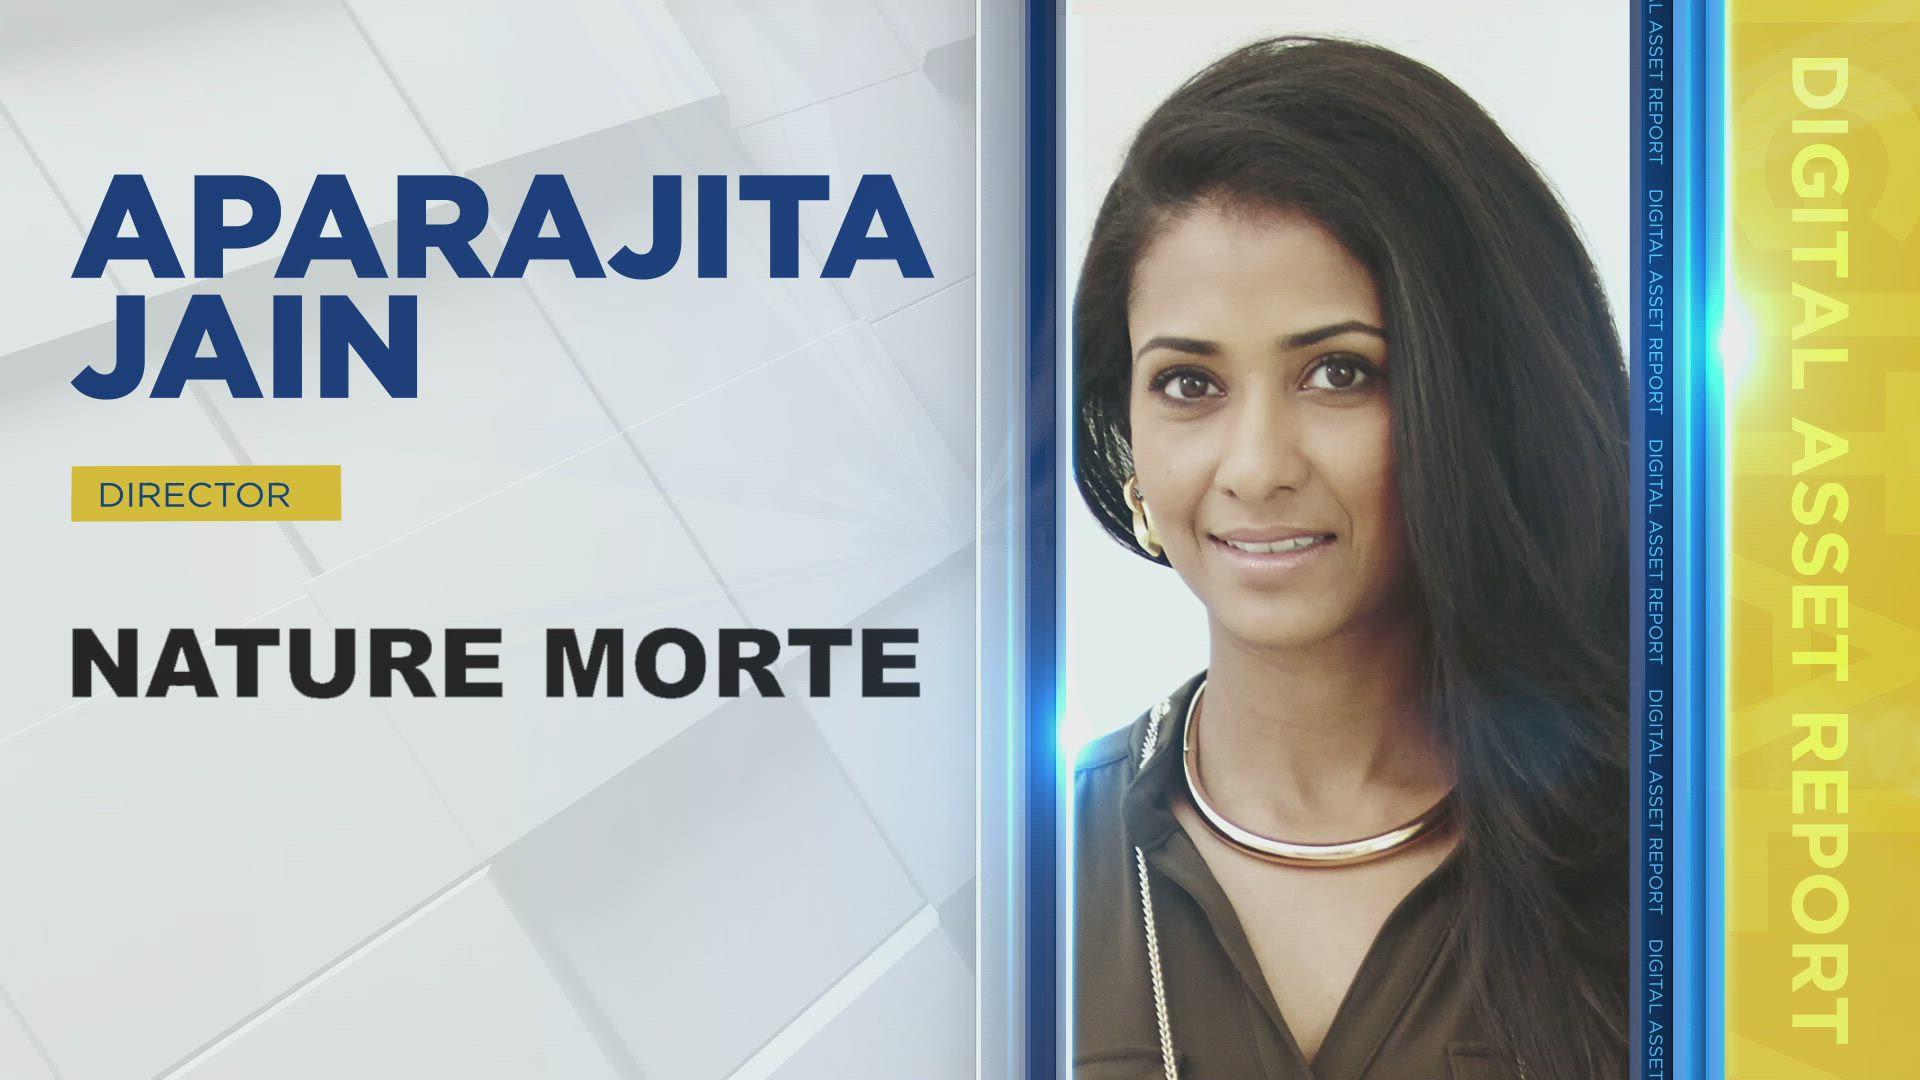 Aparajita Jain, Director of Nature Morte on NFTs